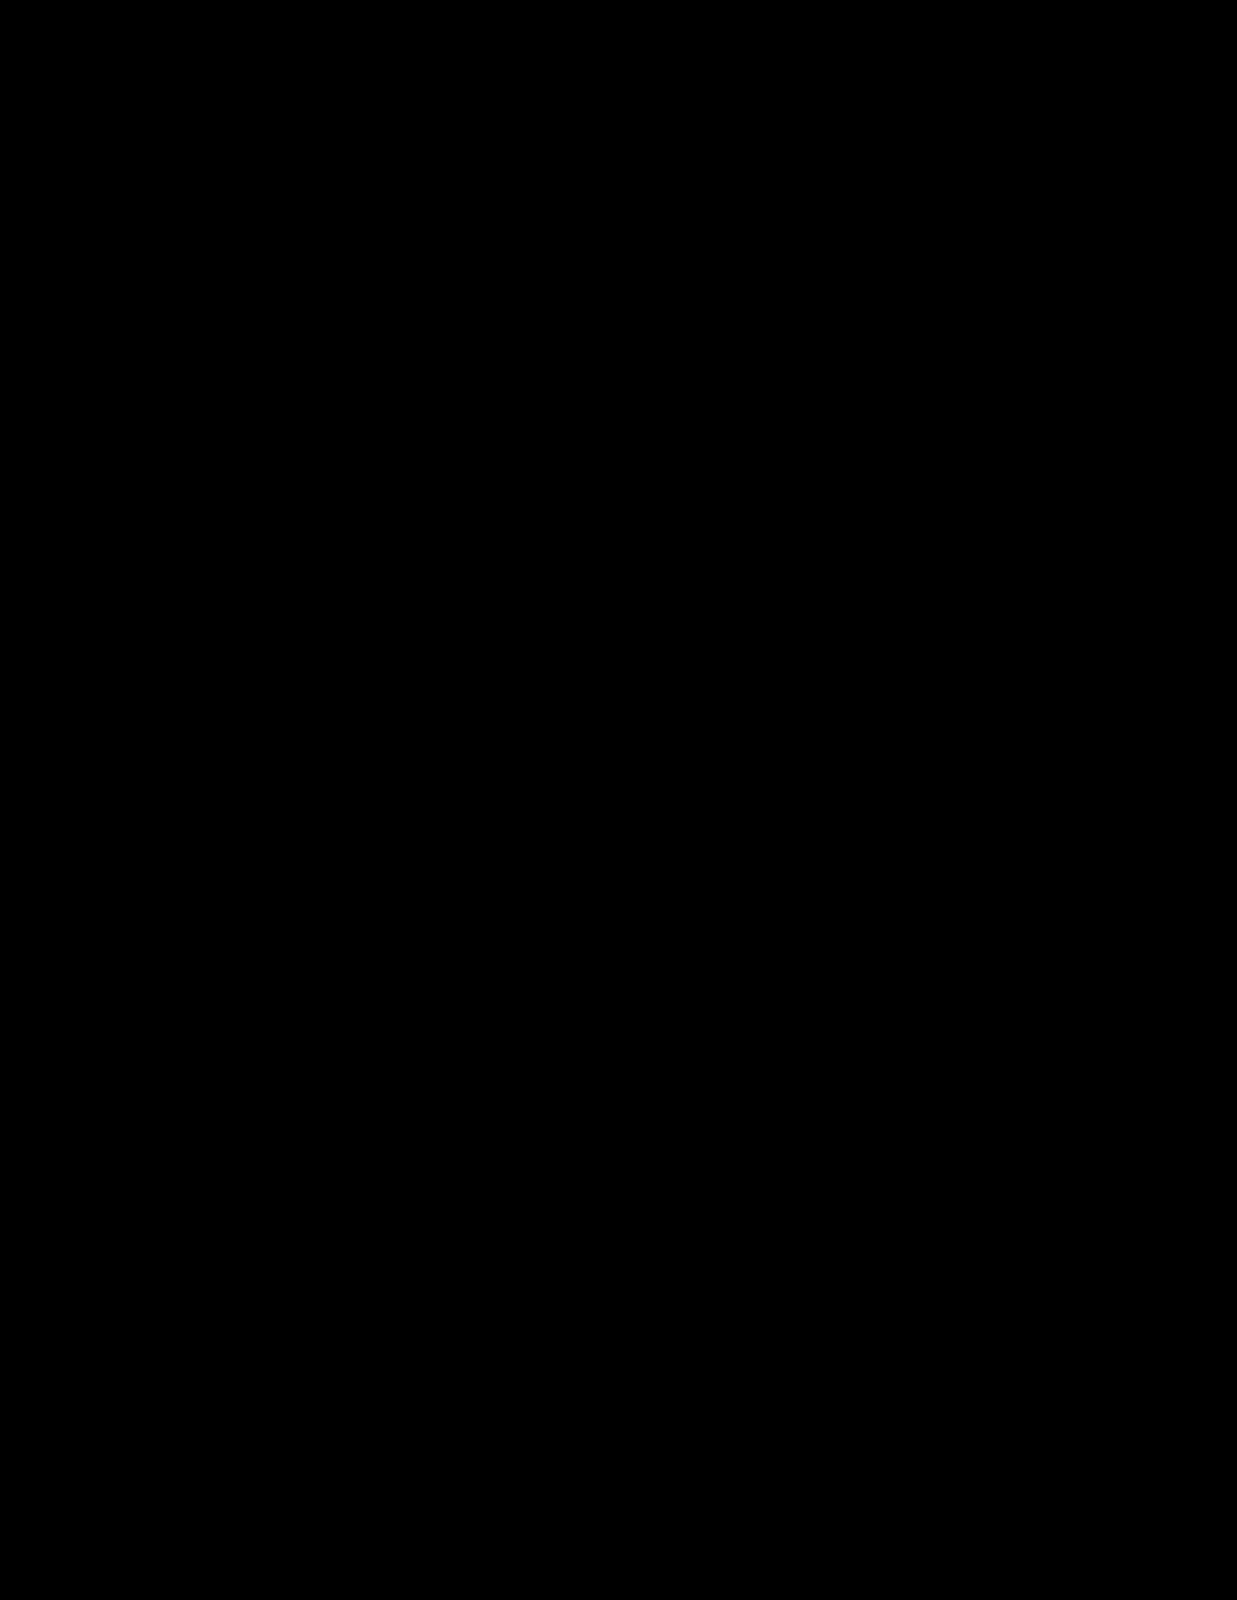 Clipart Sunglasses Colouring Clipart Sunglasses Colouring